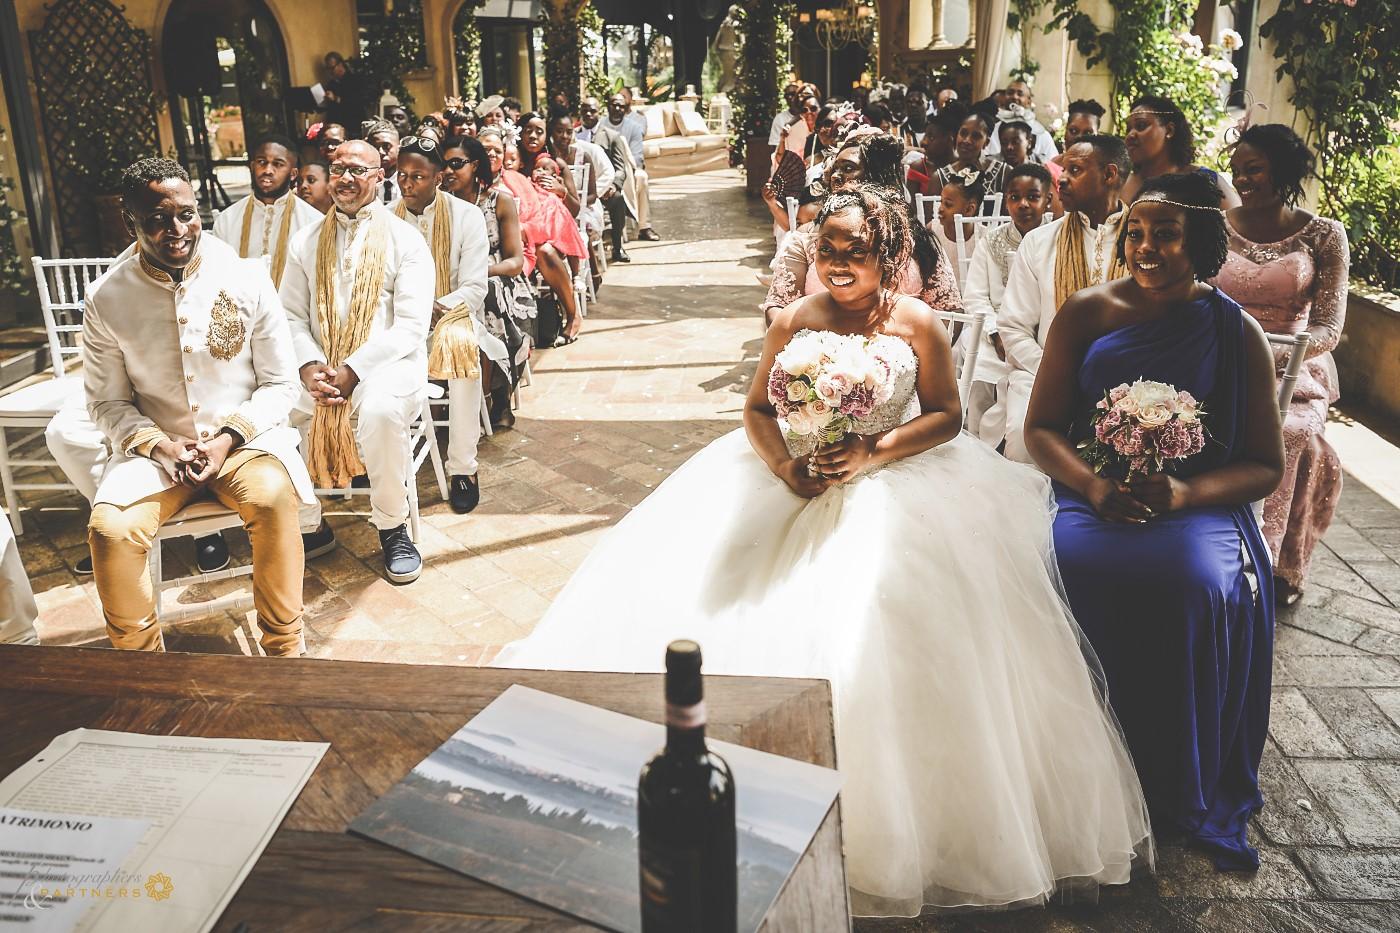 wedding_photograpers_in_tuscany_06.jpg